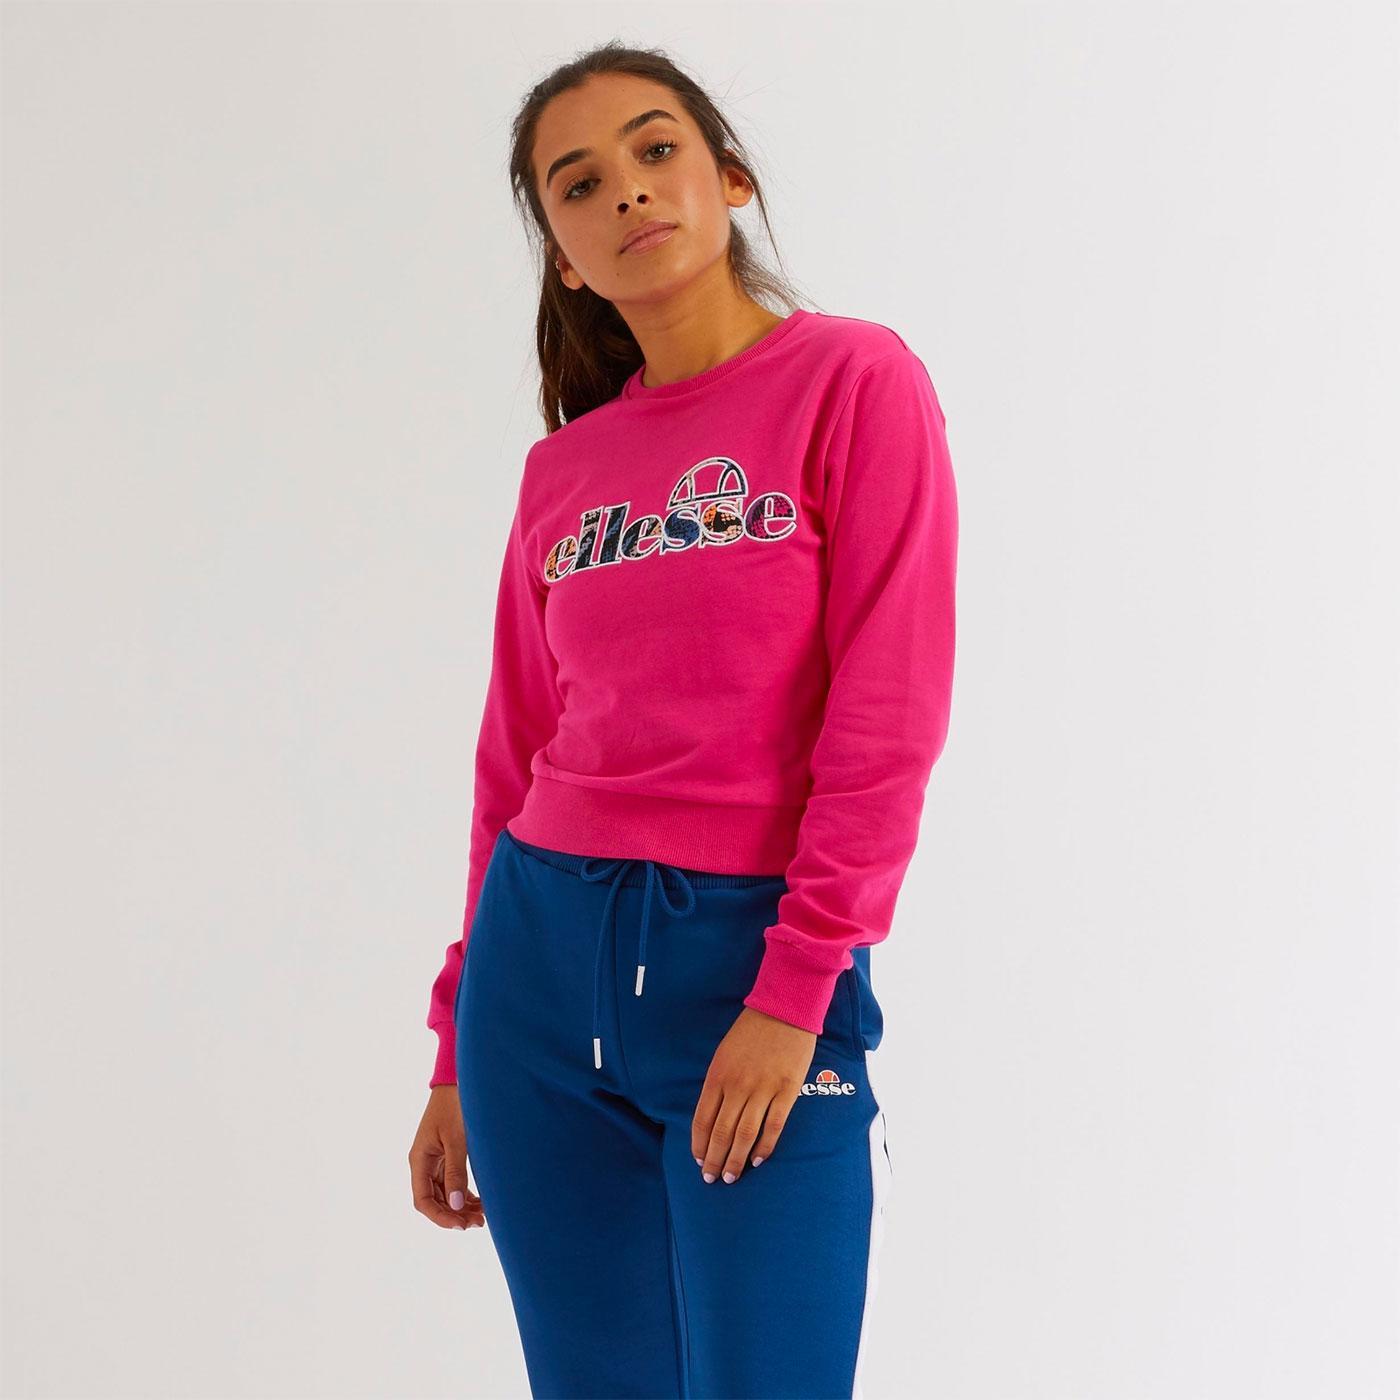 Merc ELLESSE Colourful Logo Retro Sweatshirt PINK